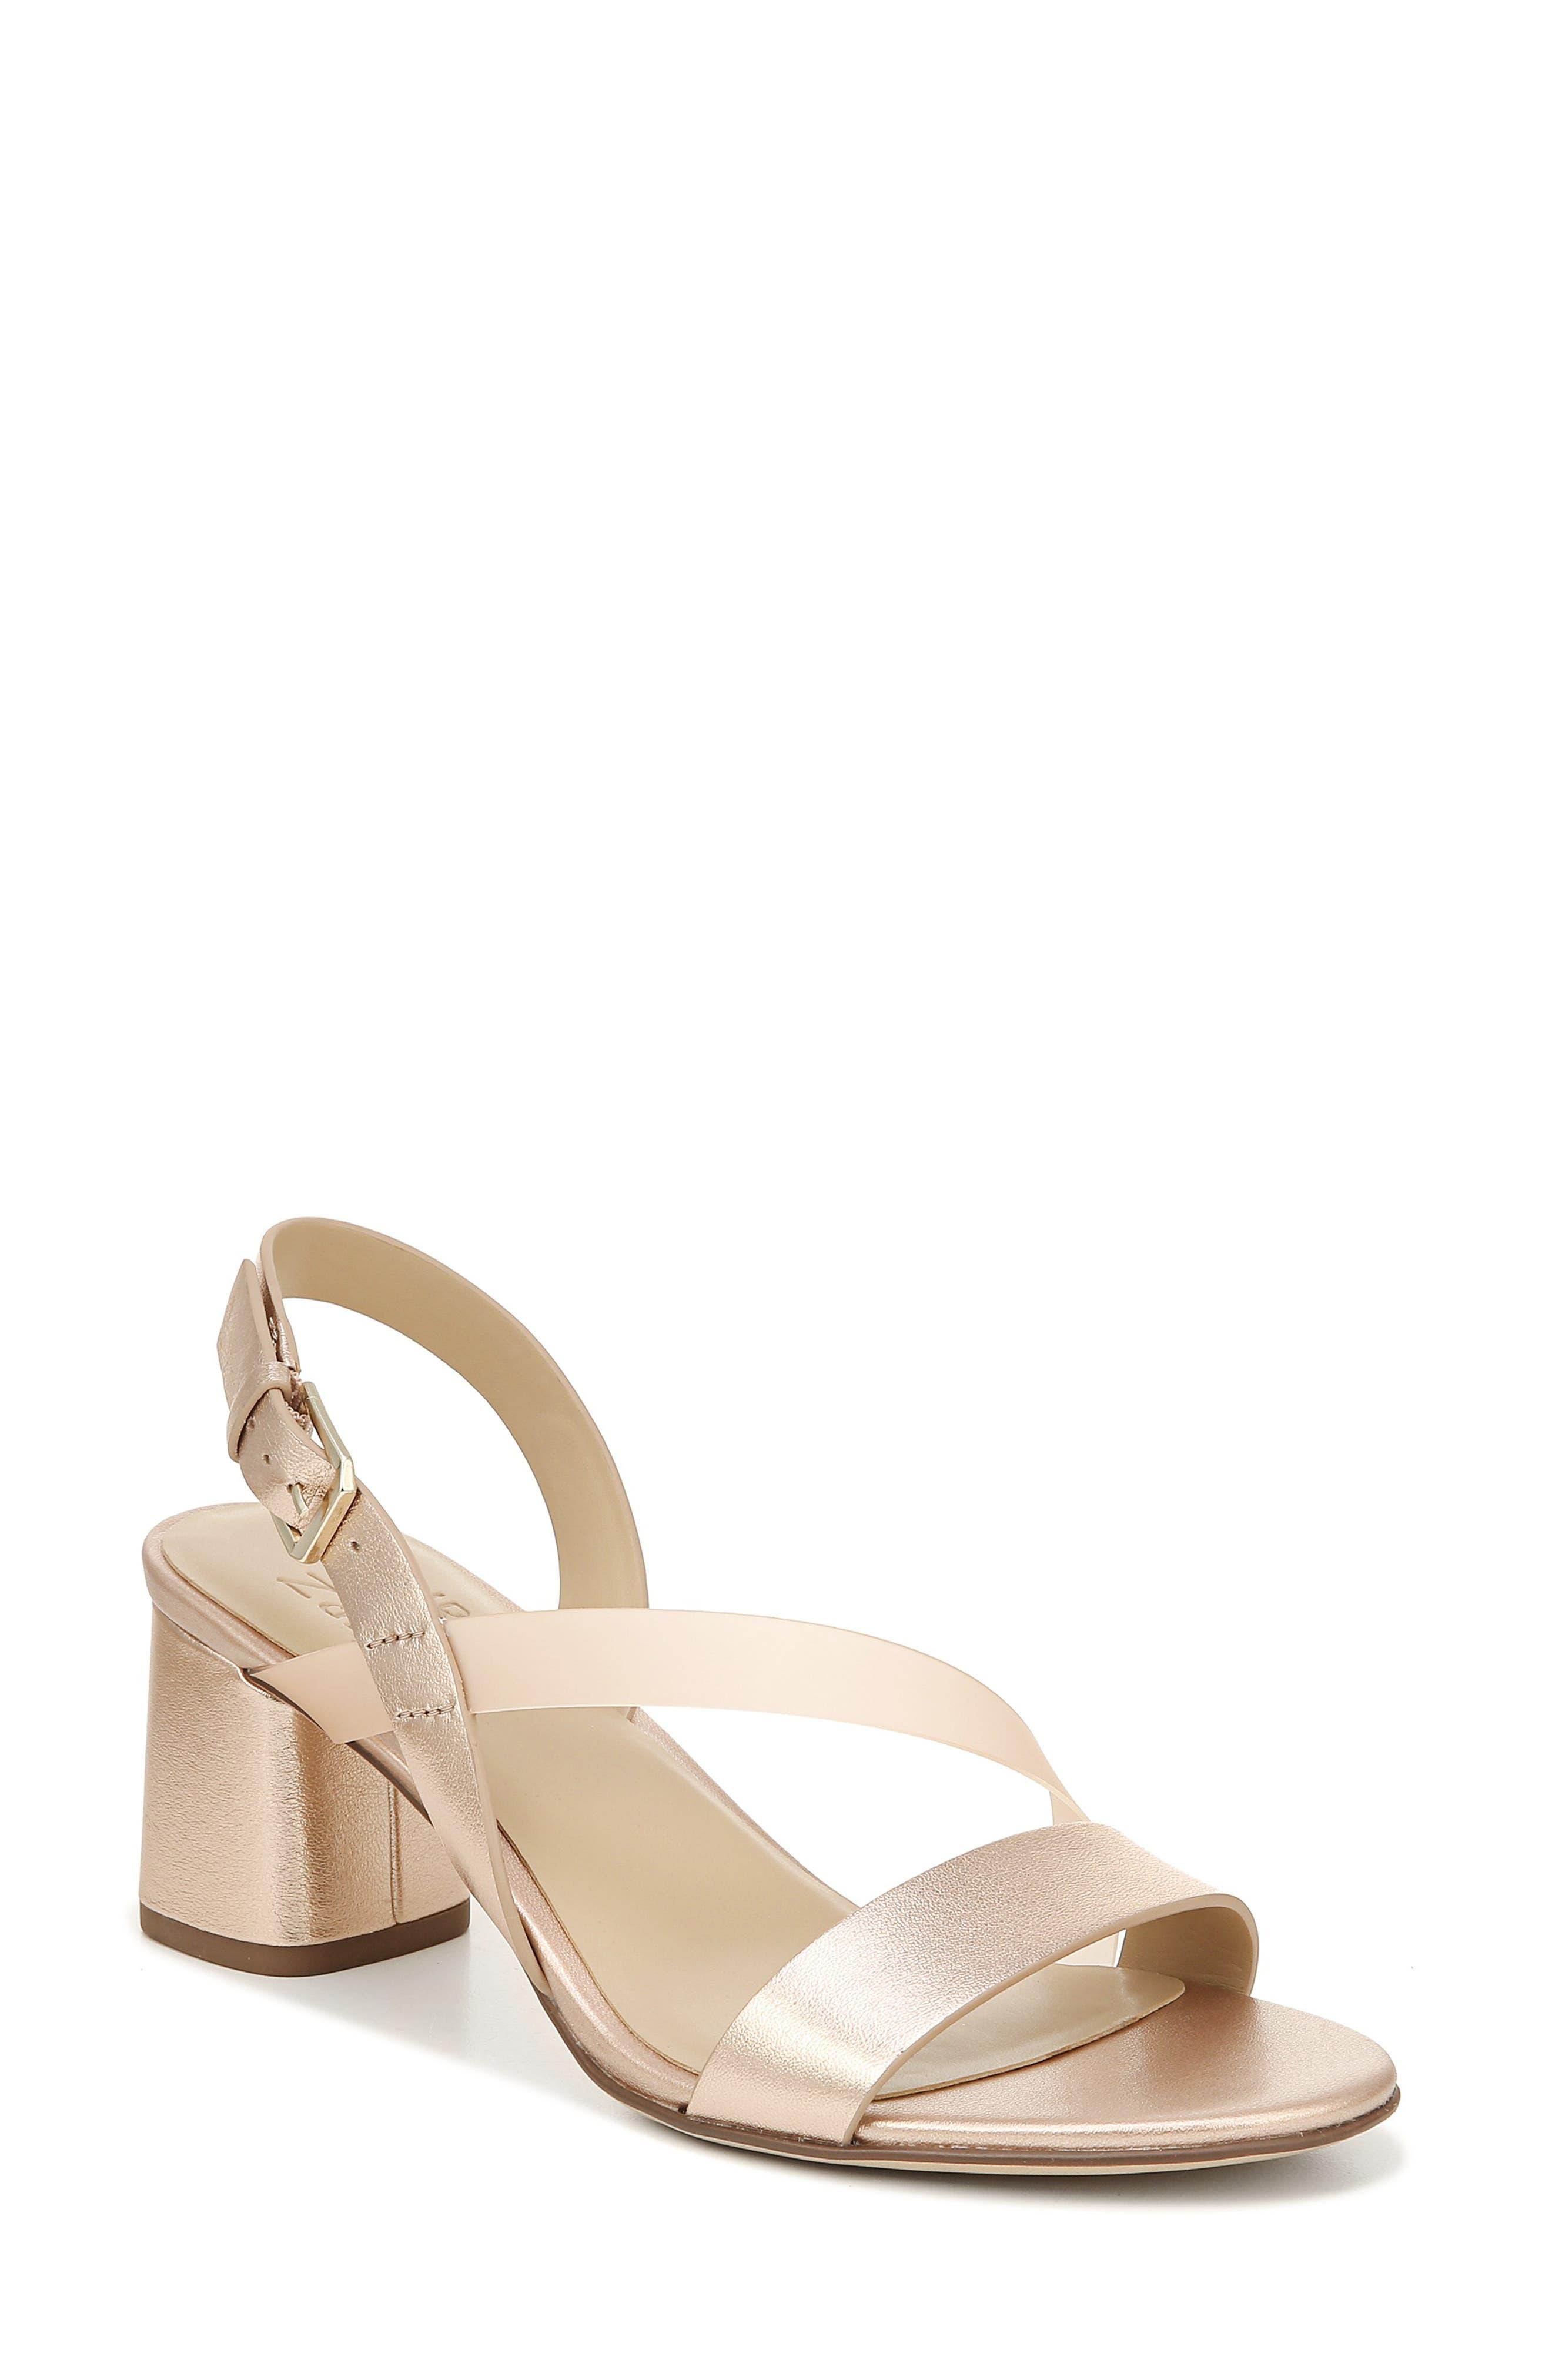 bfee87ac8c9e Naturalizer Arianna Block Heel Sandal